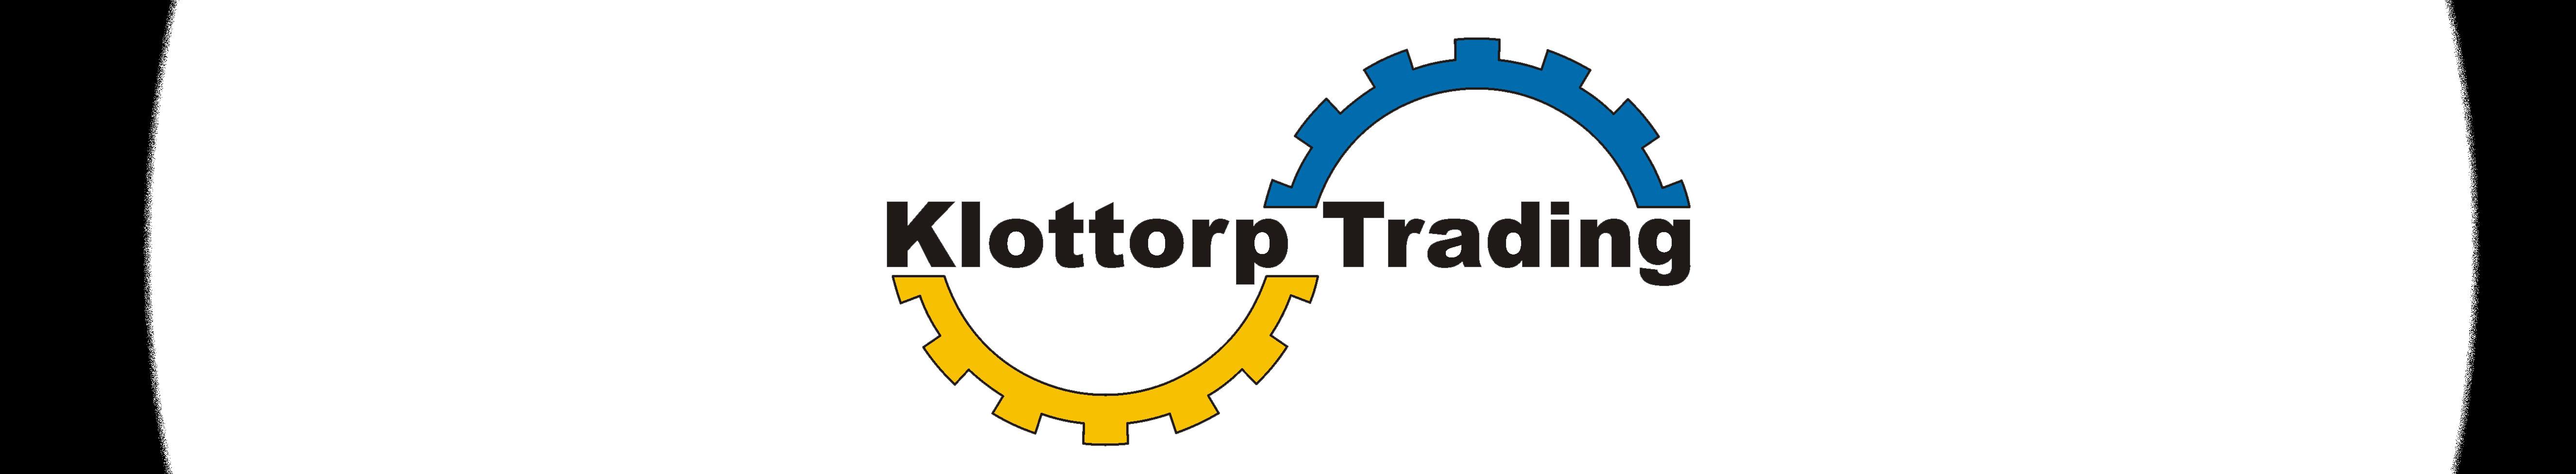 OÜ Klottorp Trading